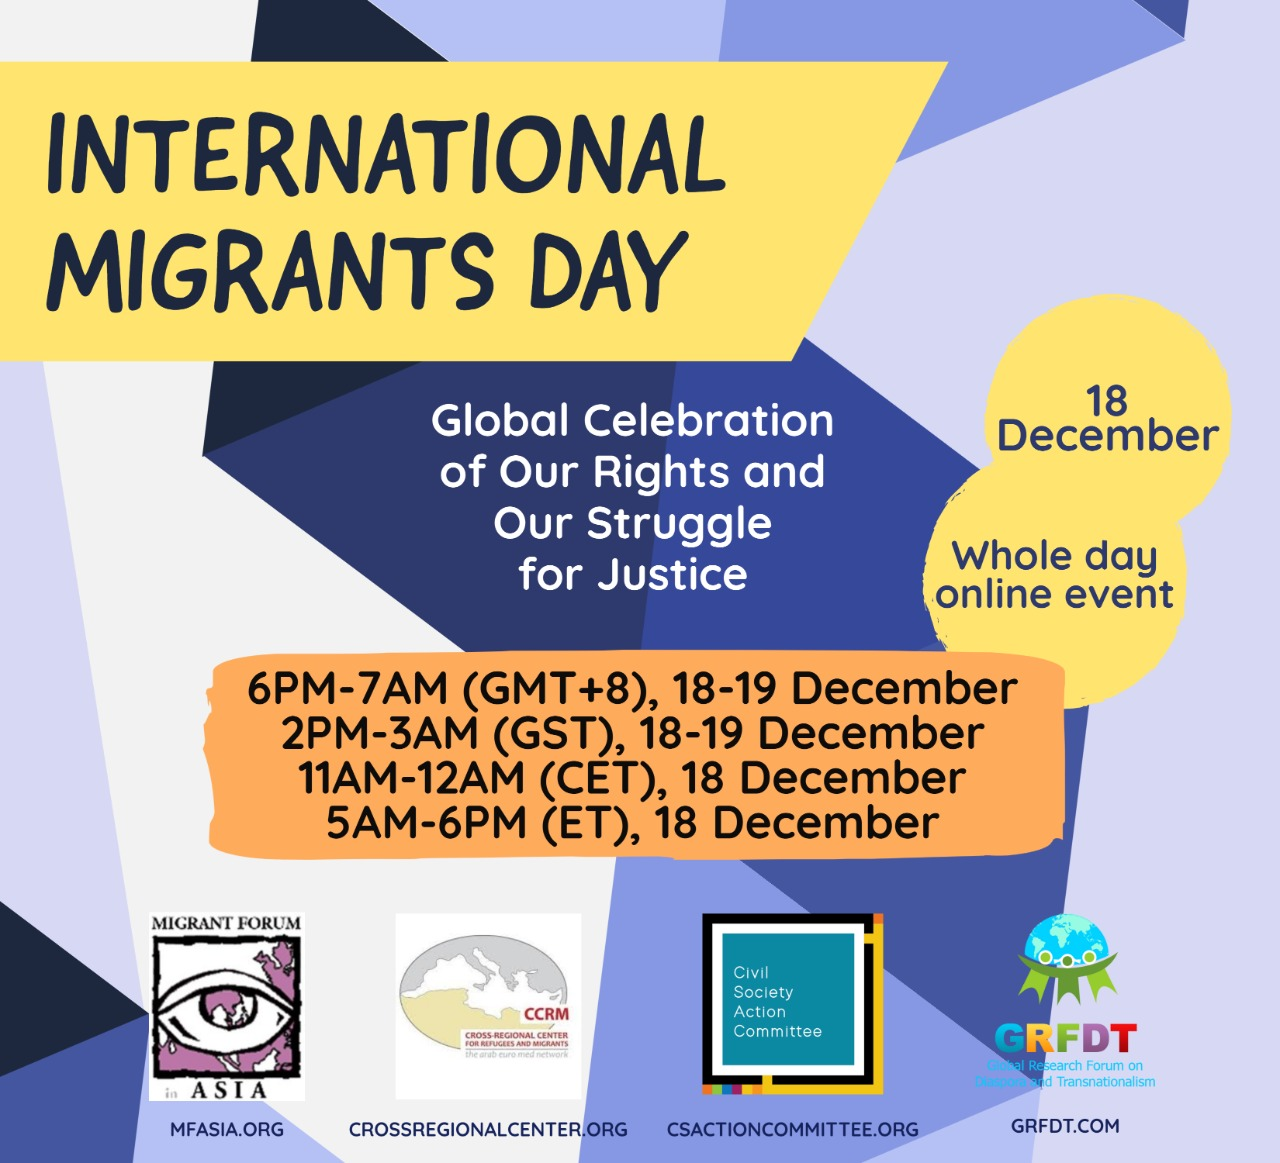 International Migrants Day 18 December 2020